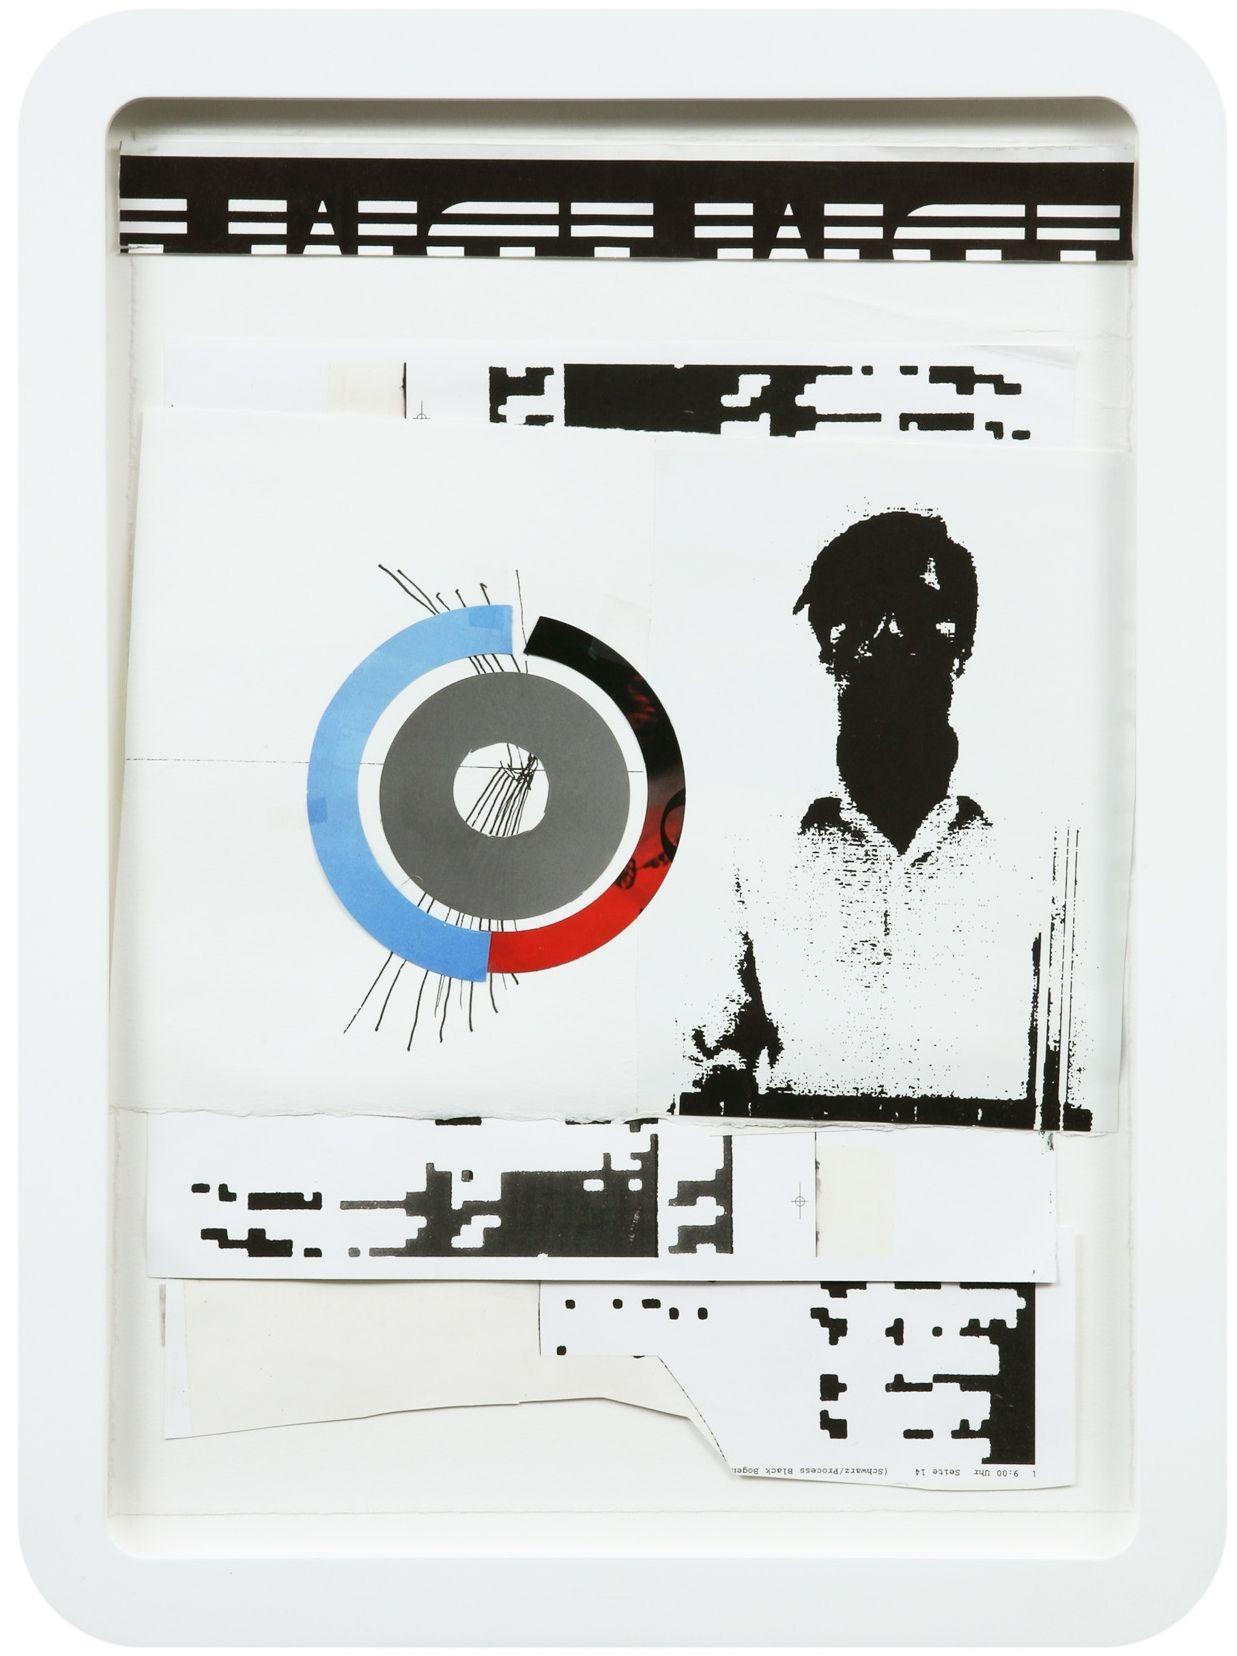 Doug Aitken, ultraworld R, 2007